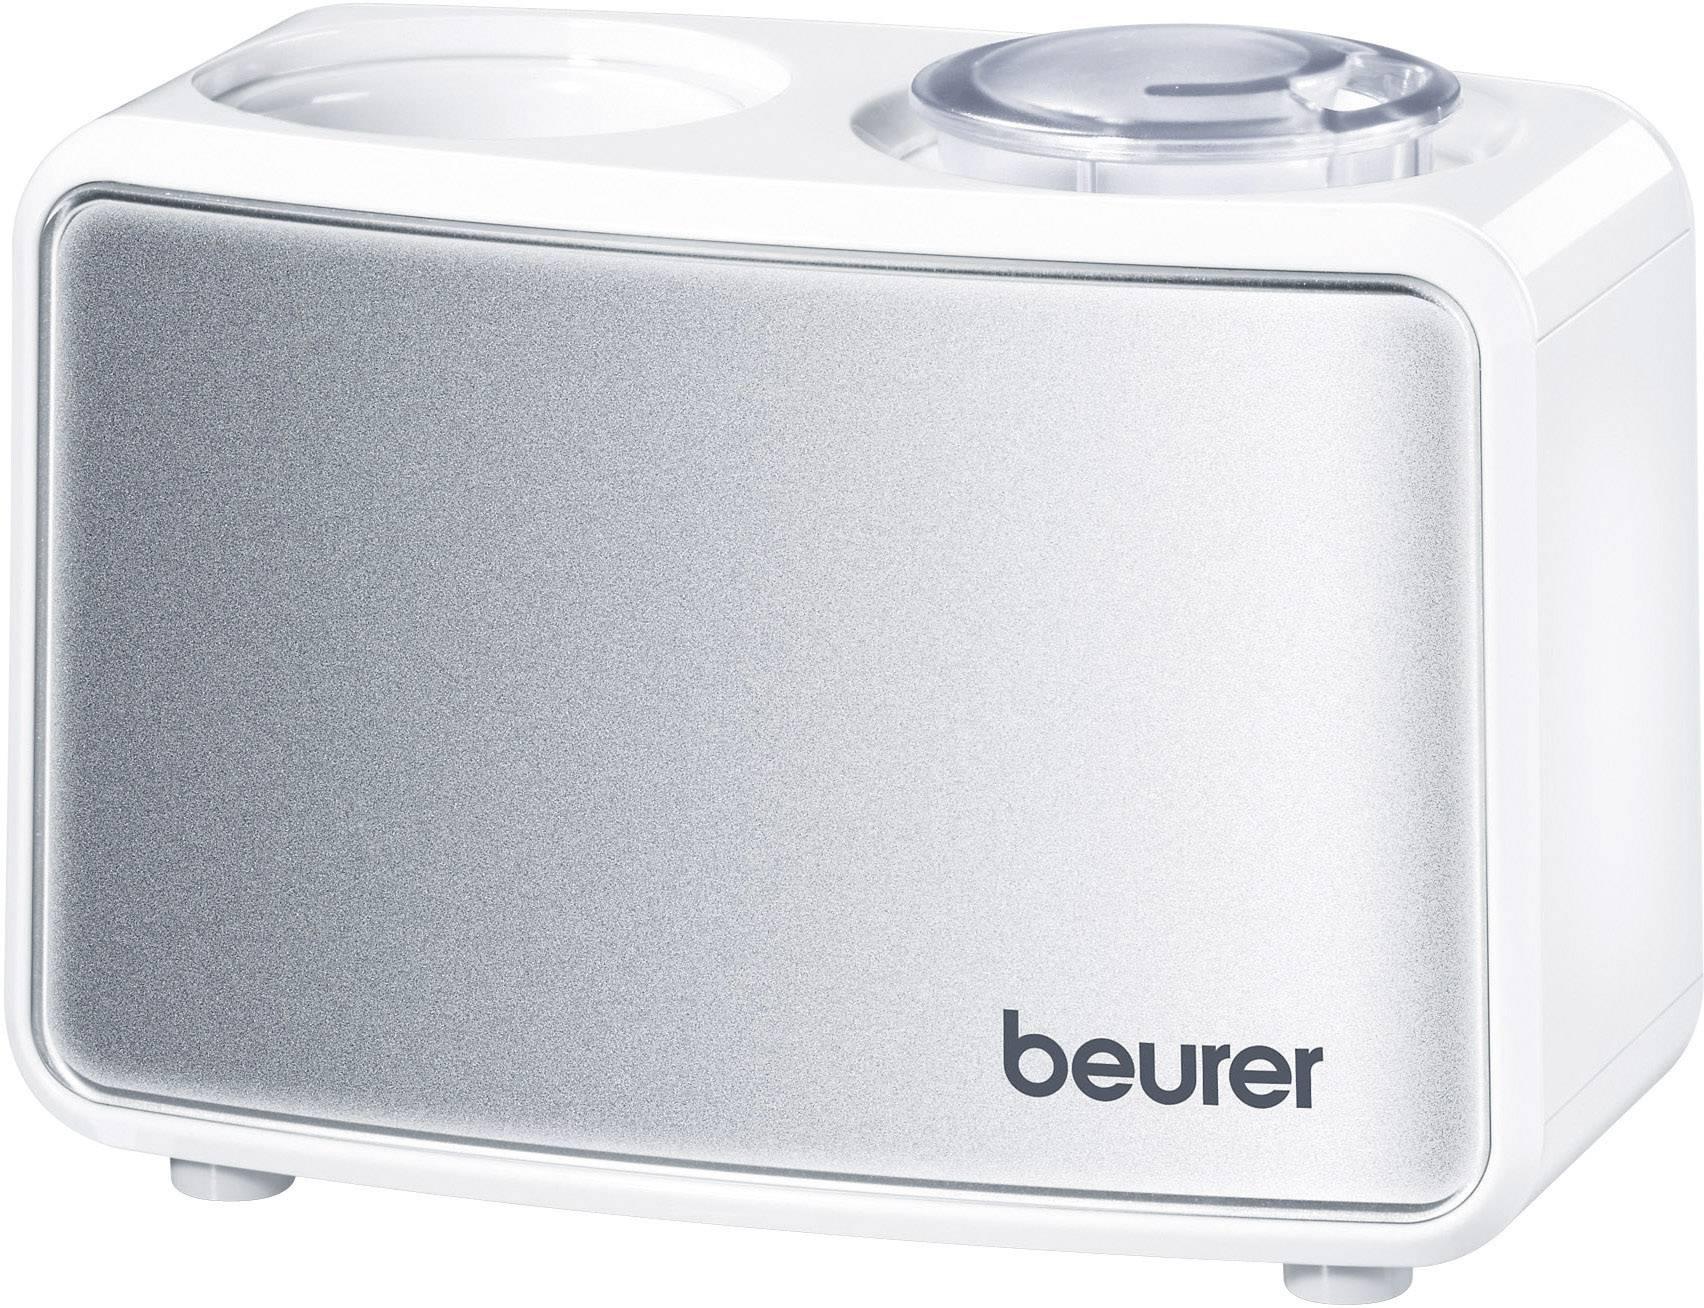 Beurer mini zvlhčovač vzduchu